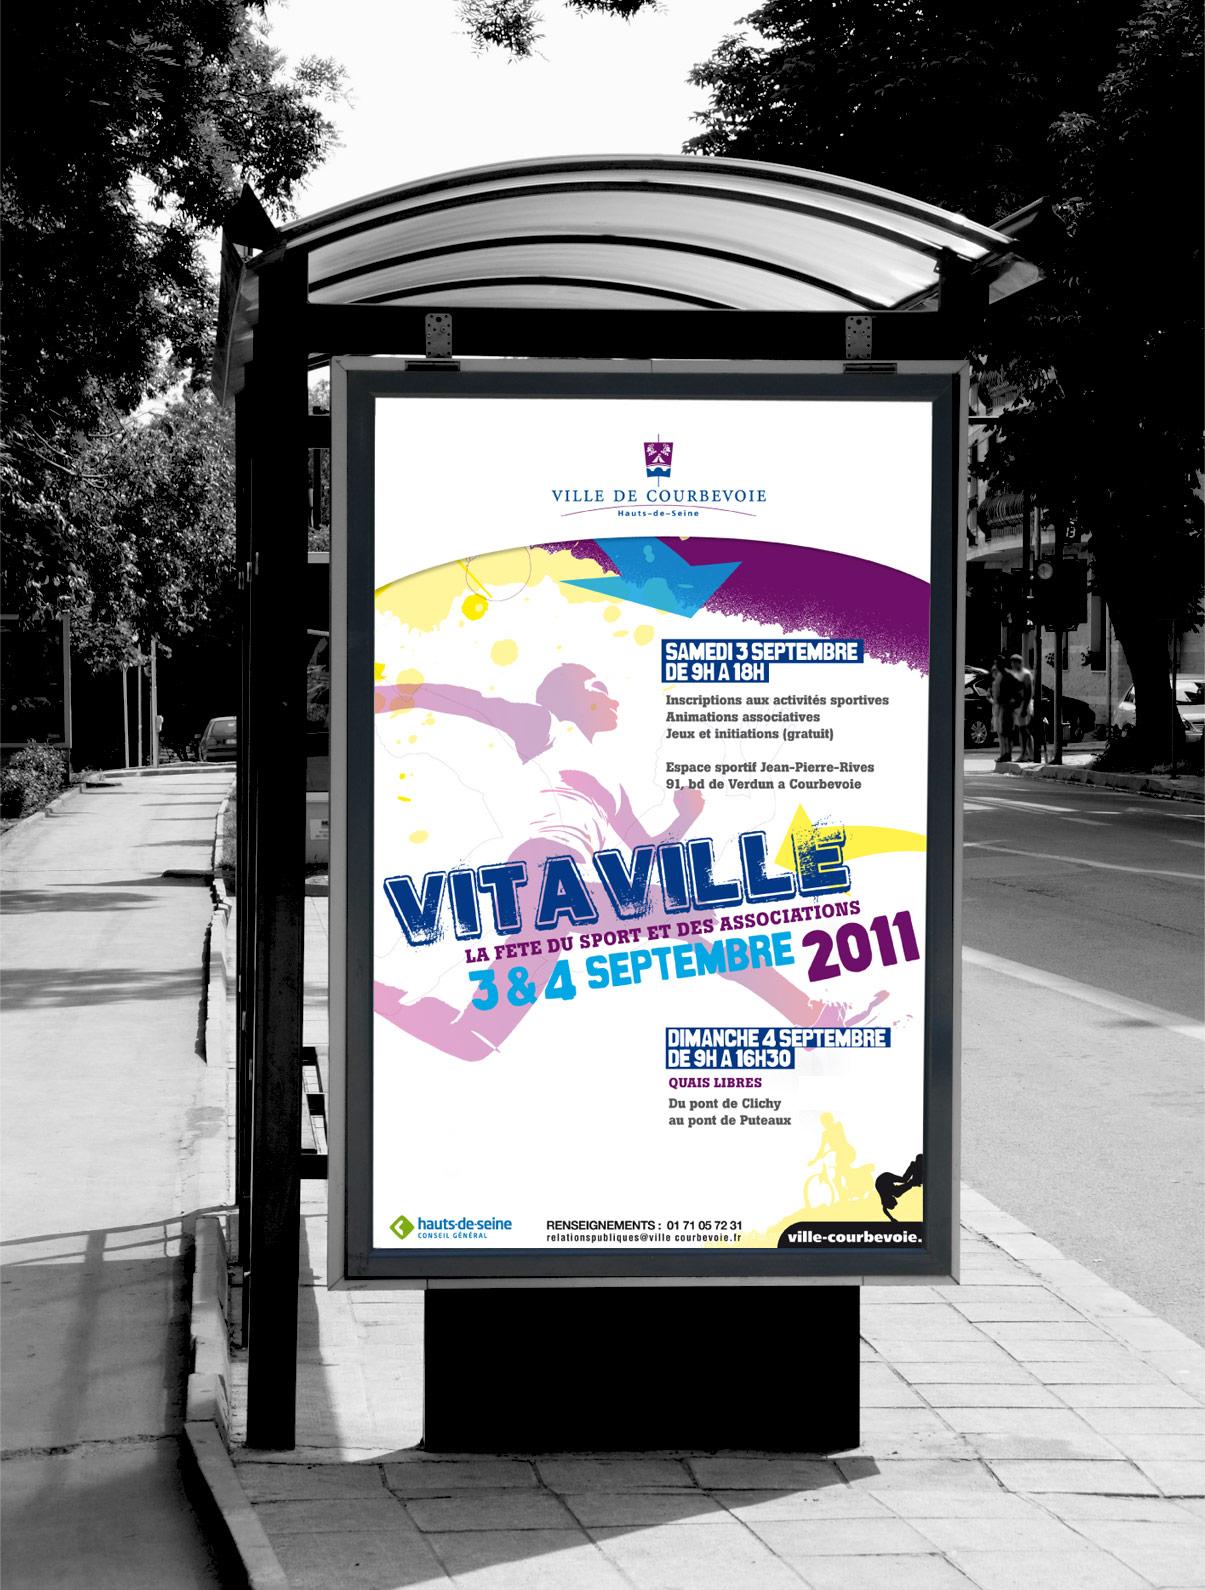 Abribus - ville - Courbevoie - Vitaville - Design graphique - © Olivier Varma